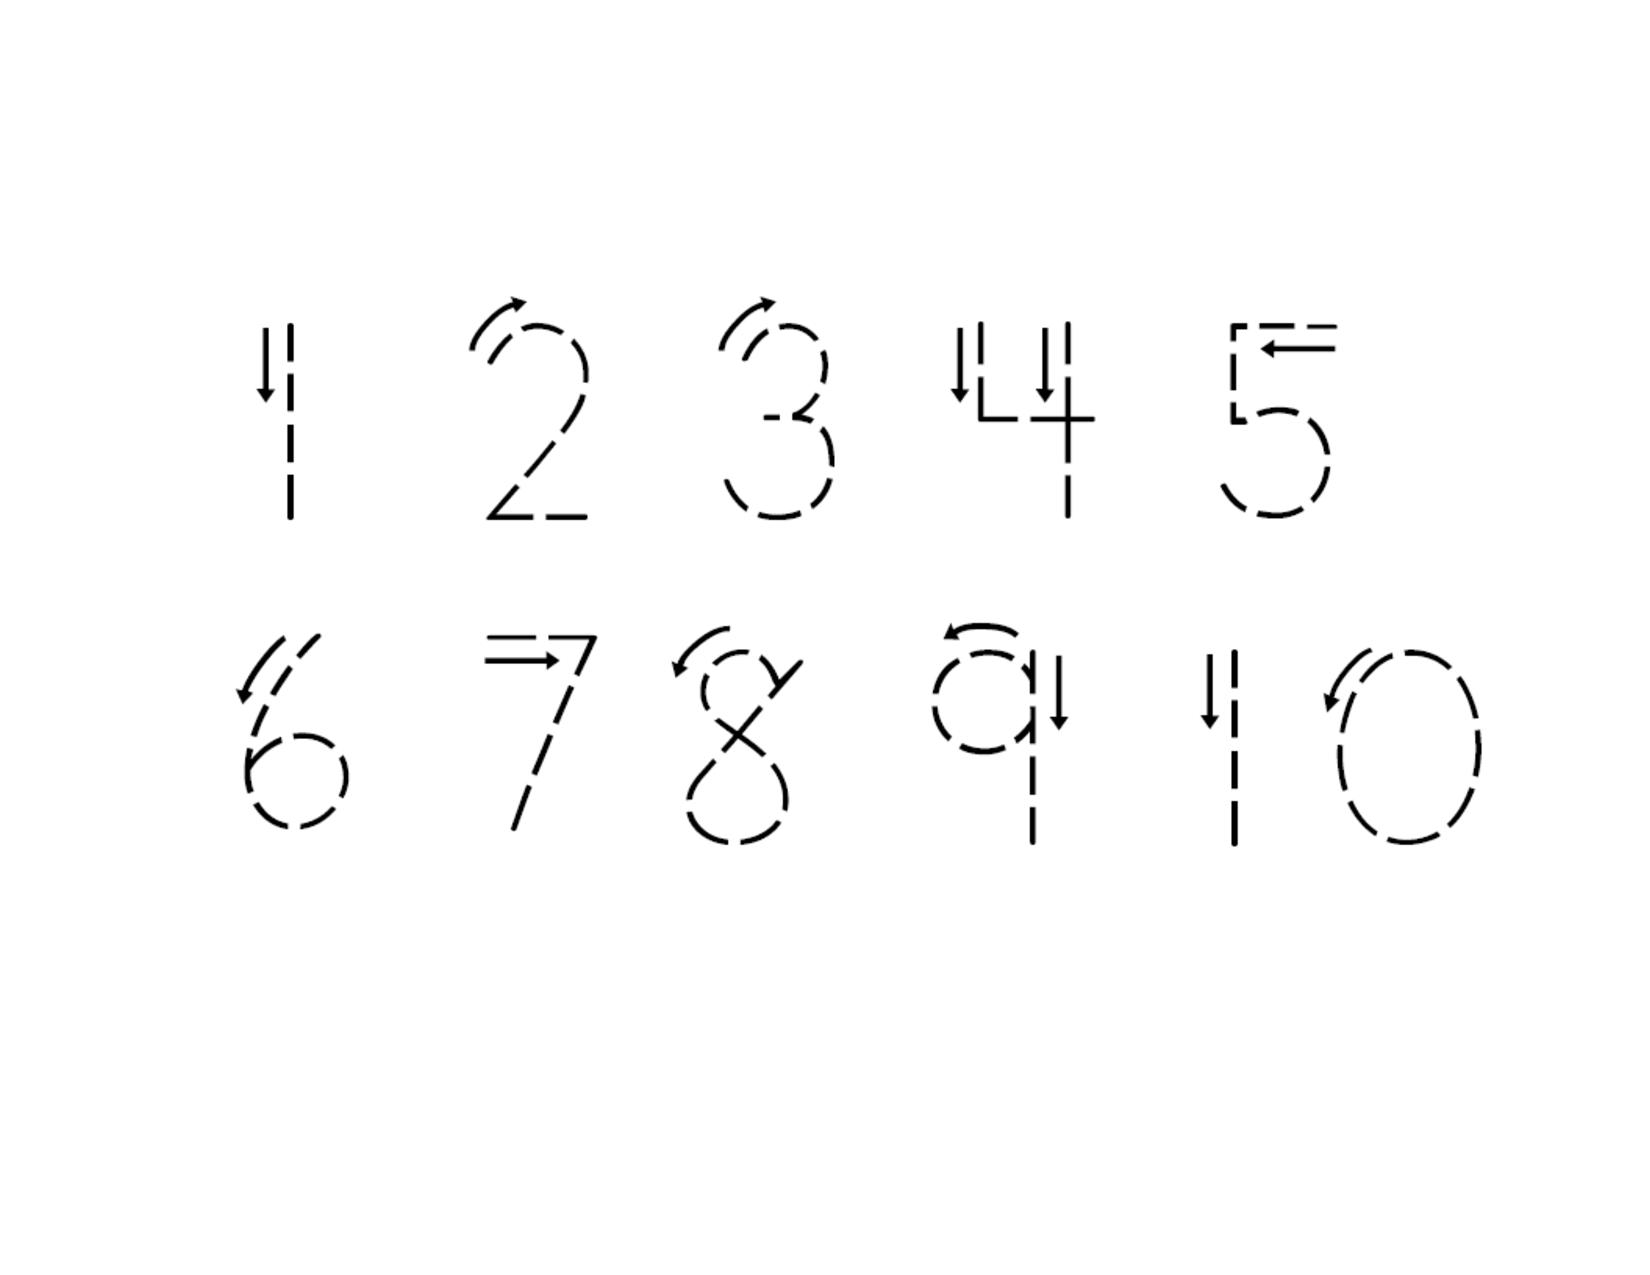 14 Best Images Of Practice Writing Numbers 1 20 Worksheet